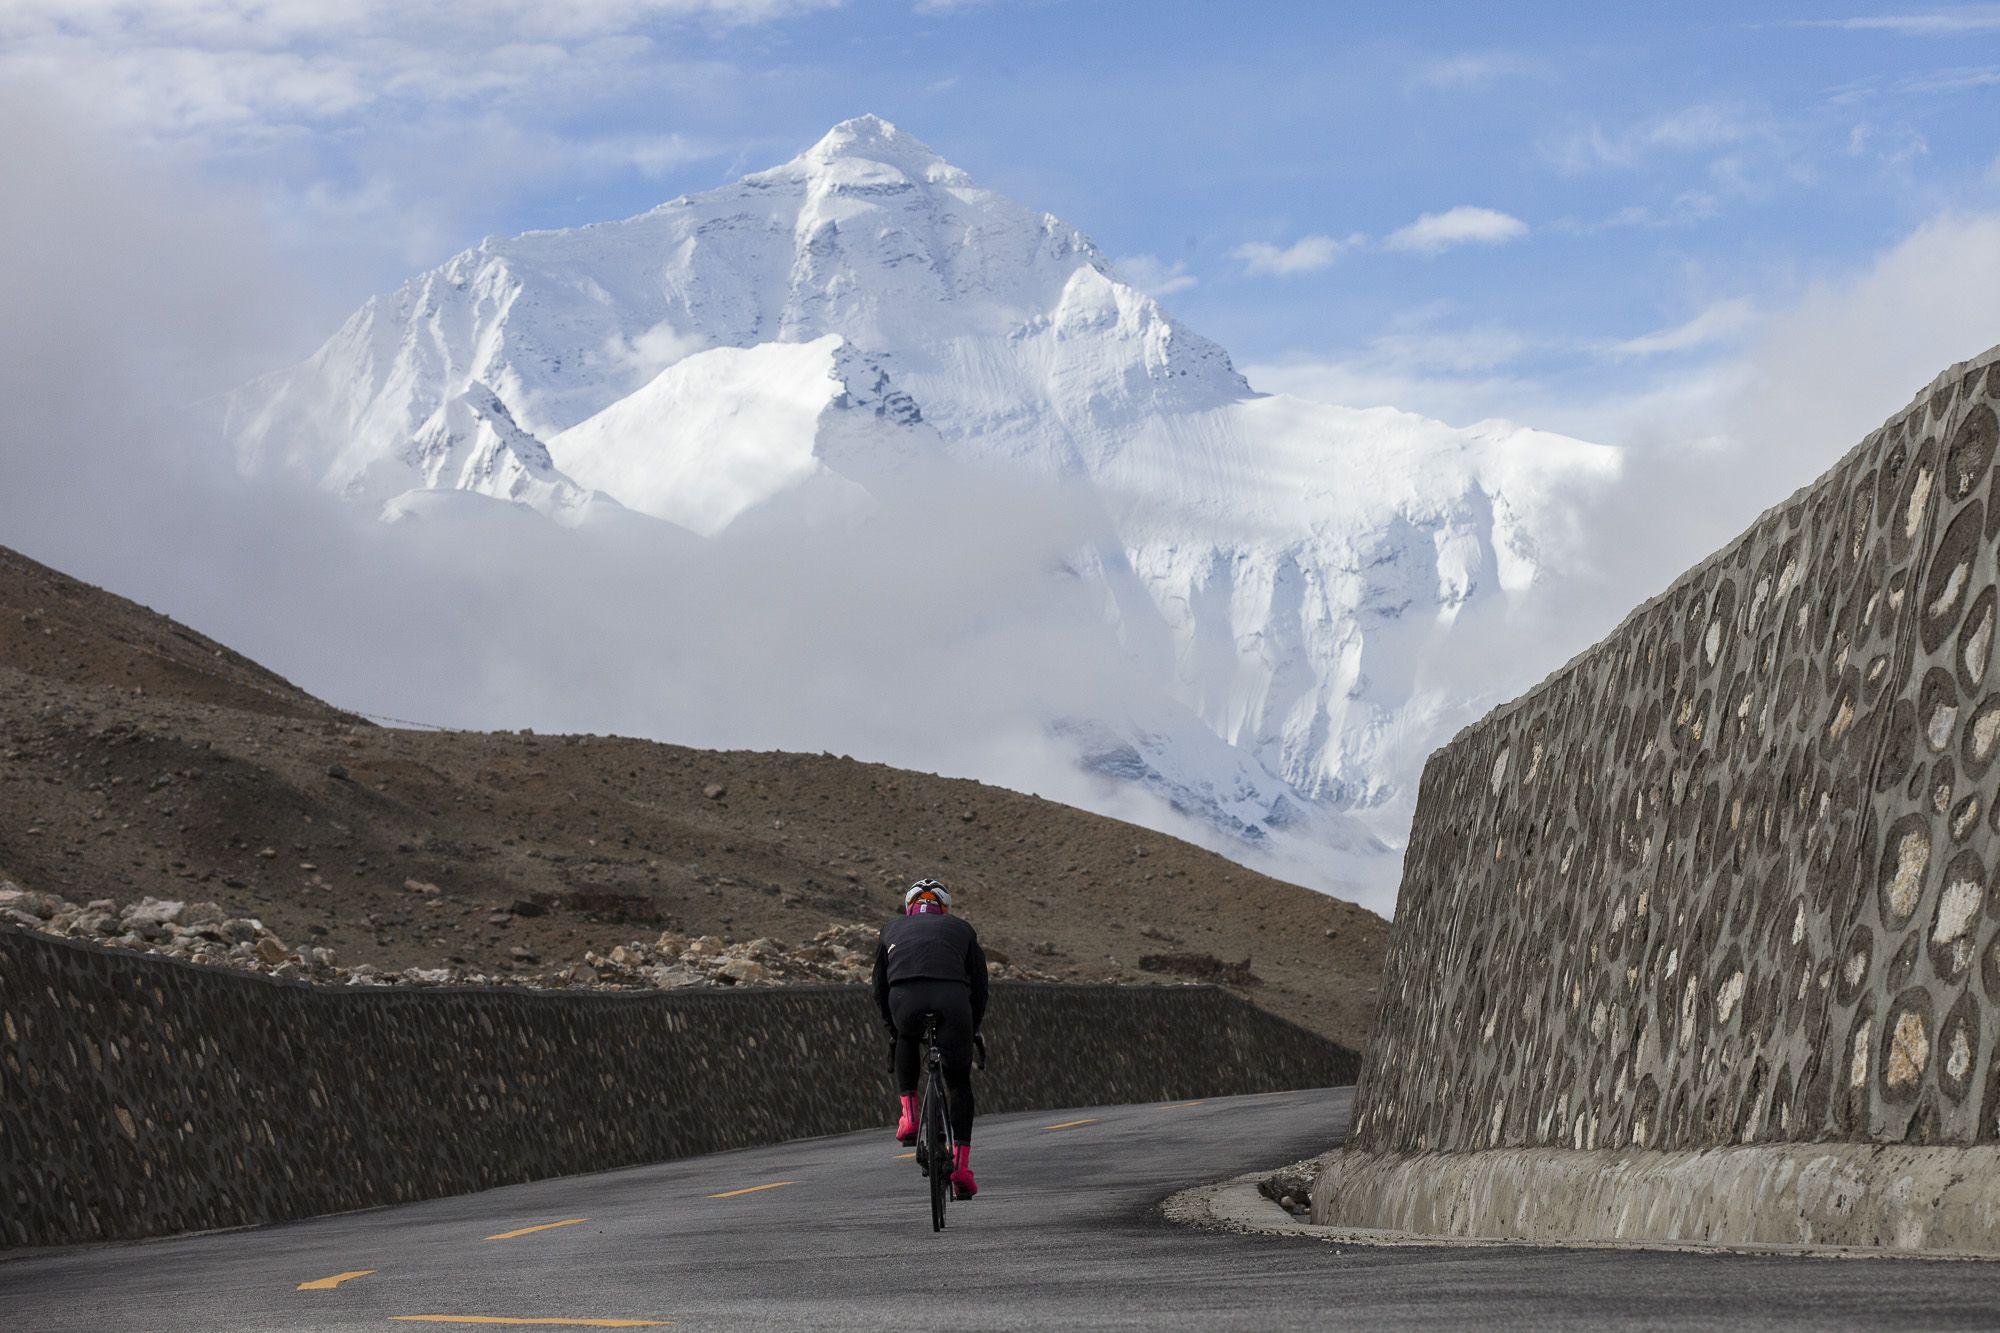 First Cyclist Everests Mount Everest -Riding a Bike Up Mt Everest